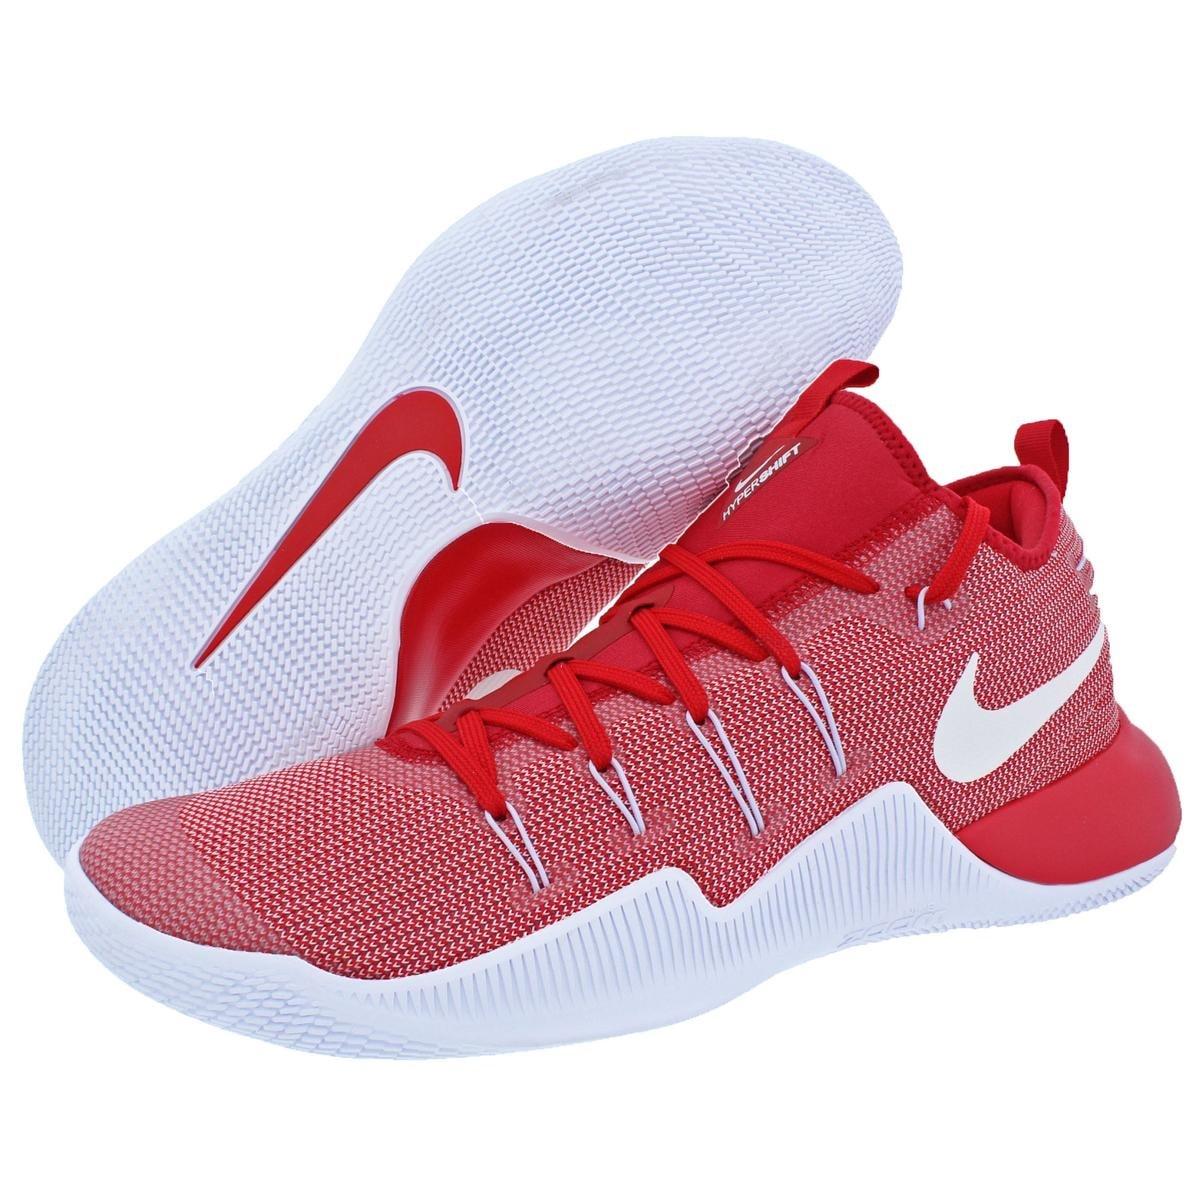 buy popular 0479a 19539 ... new style nike hypershift zoom nike tb free mid top basketball uomos  scarpe 44gq7wr 903fe bf69f